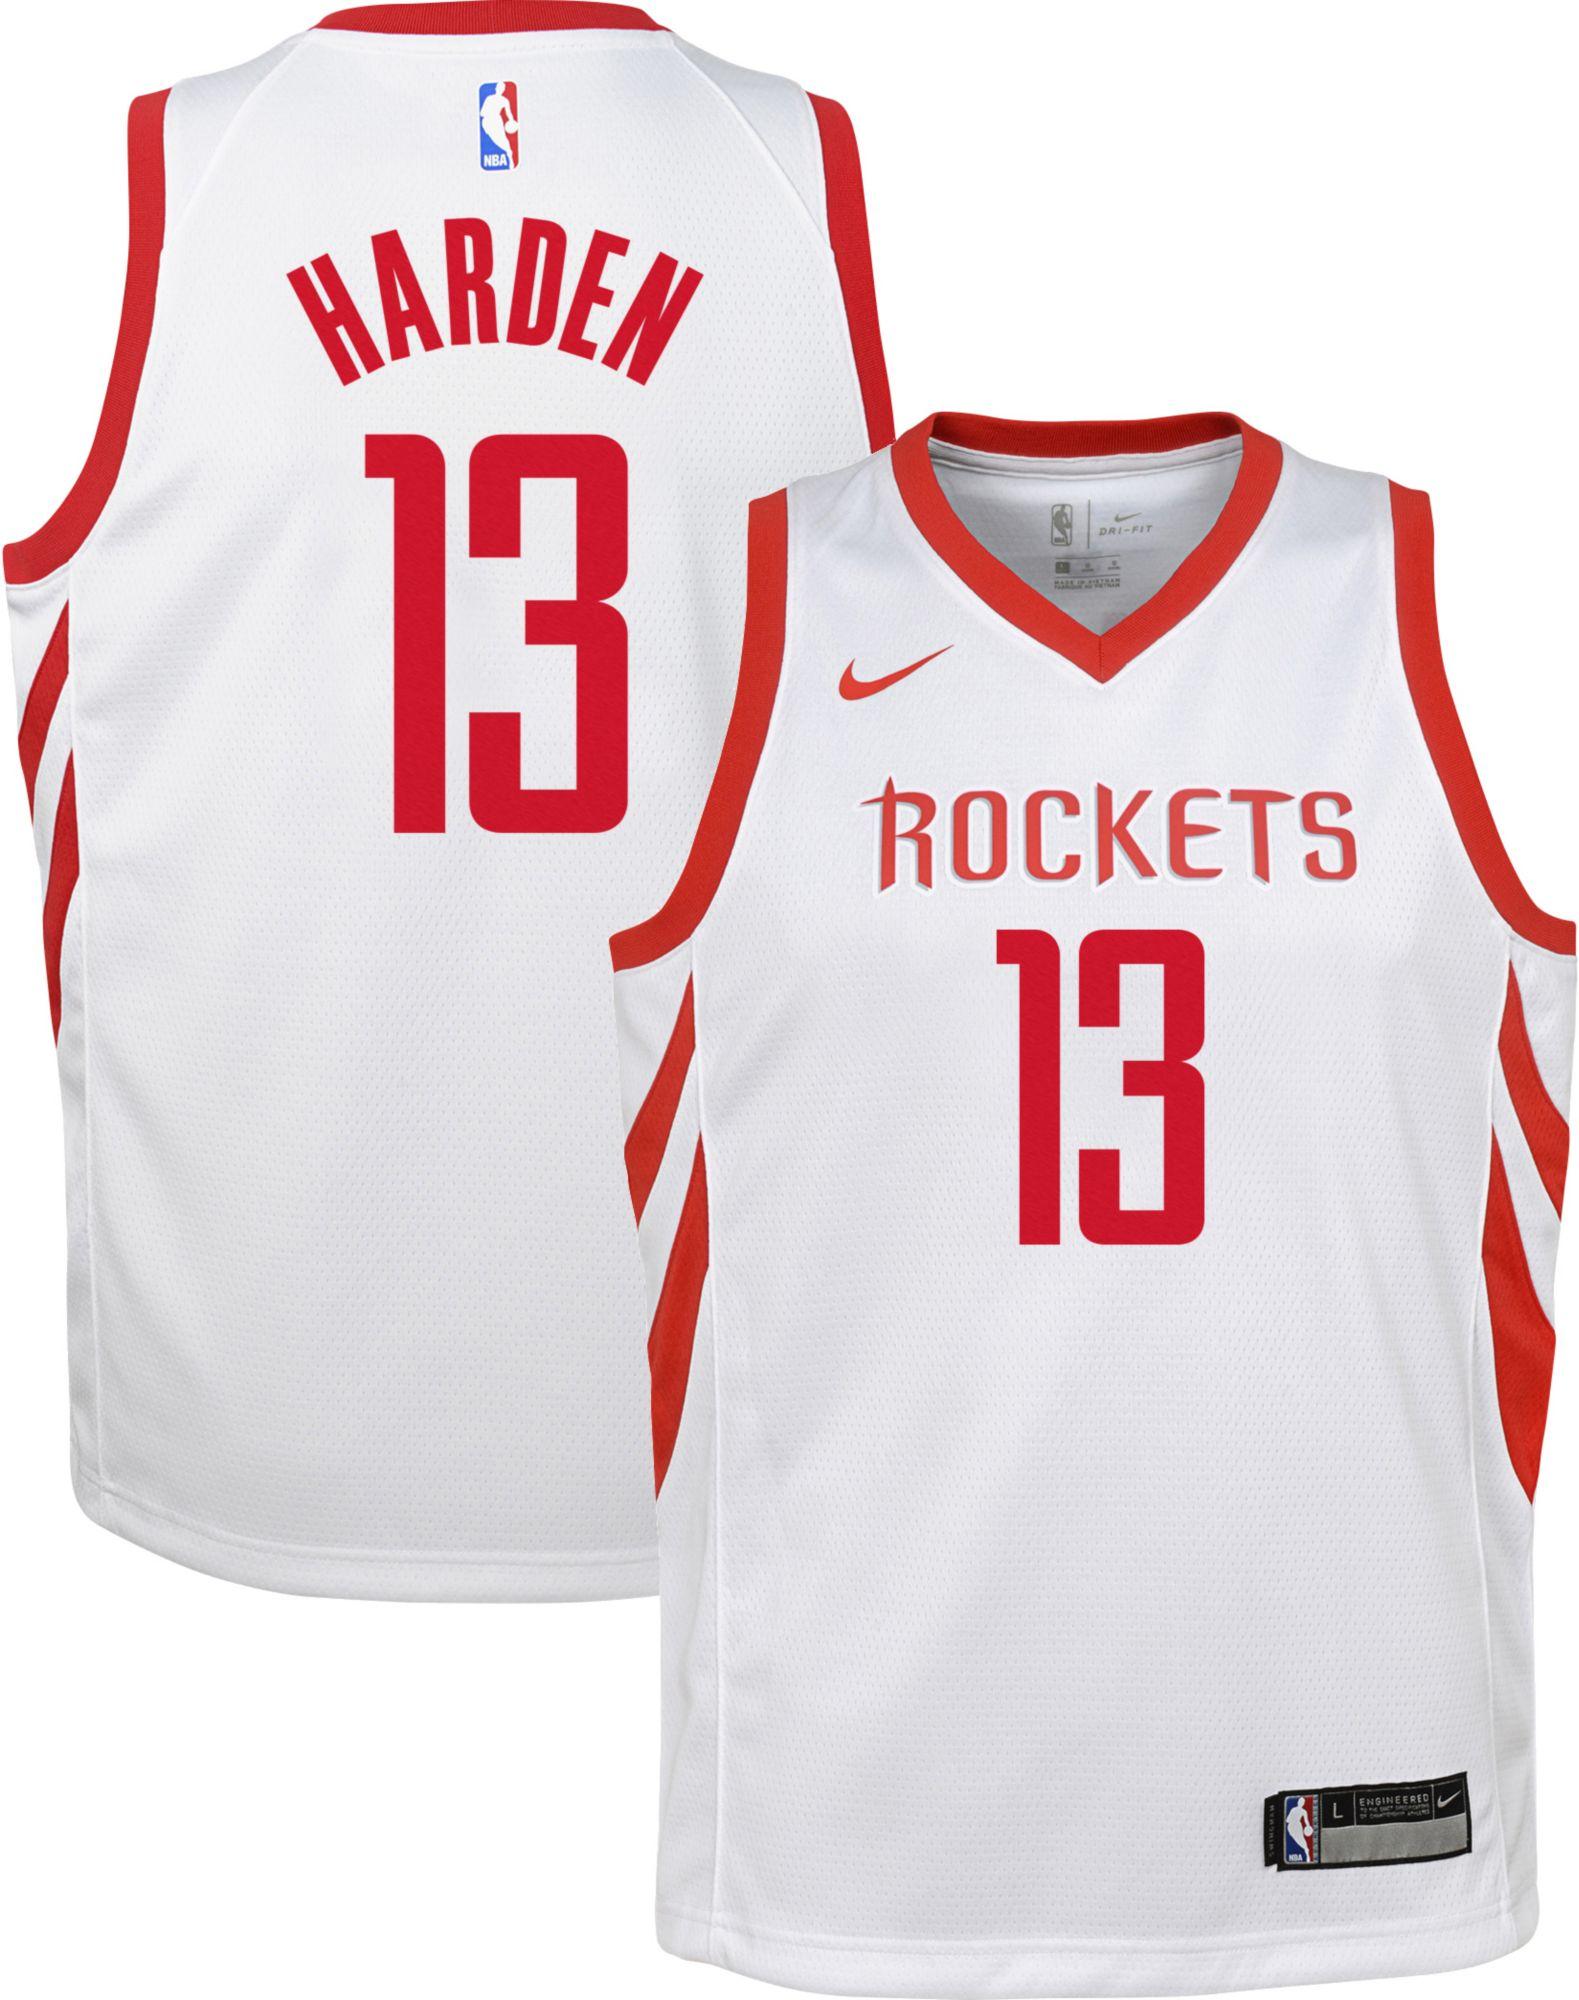 Nike Youth Houston Rockets James Harden #13 White Dri-FIT Swingman Jersey    DICK'S Sporting Goods